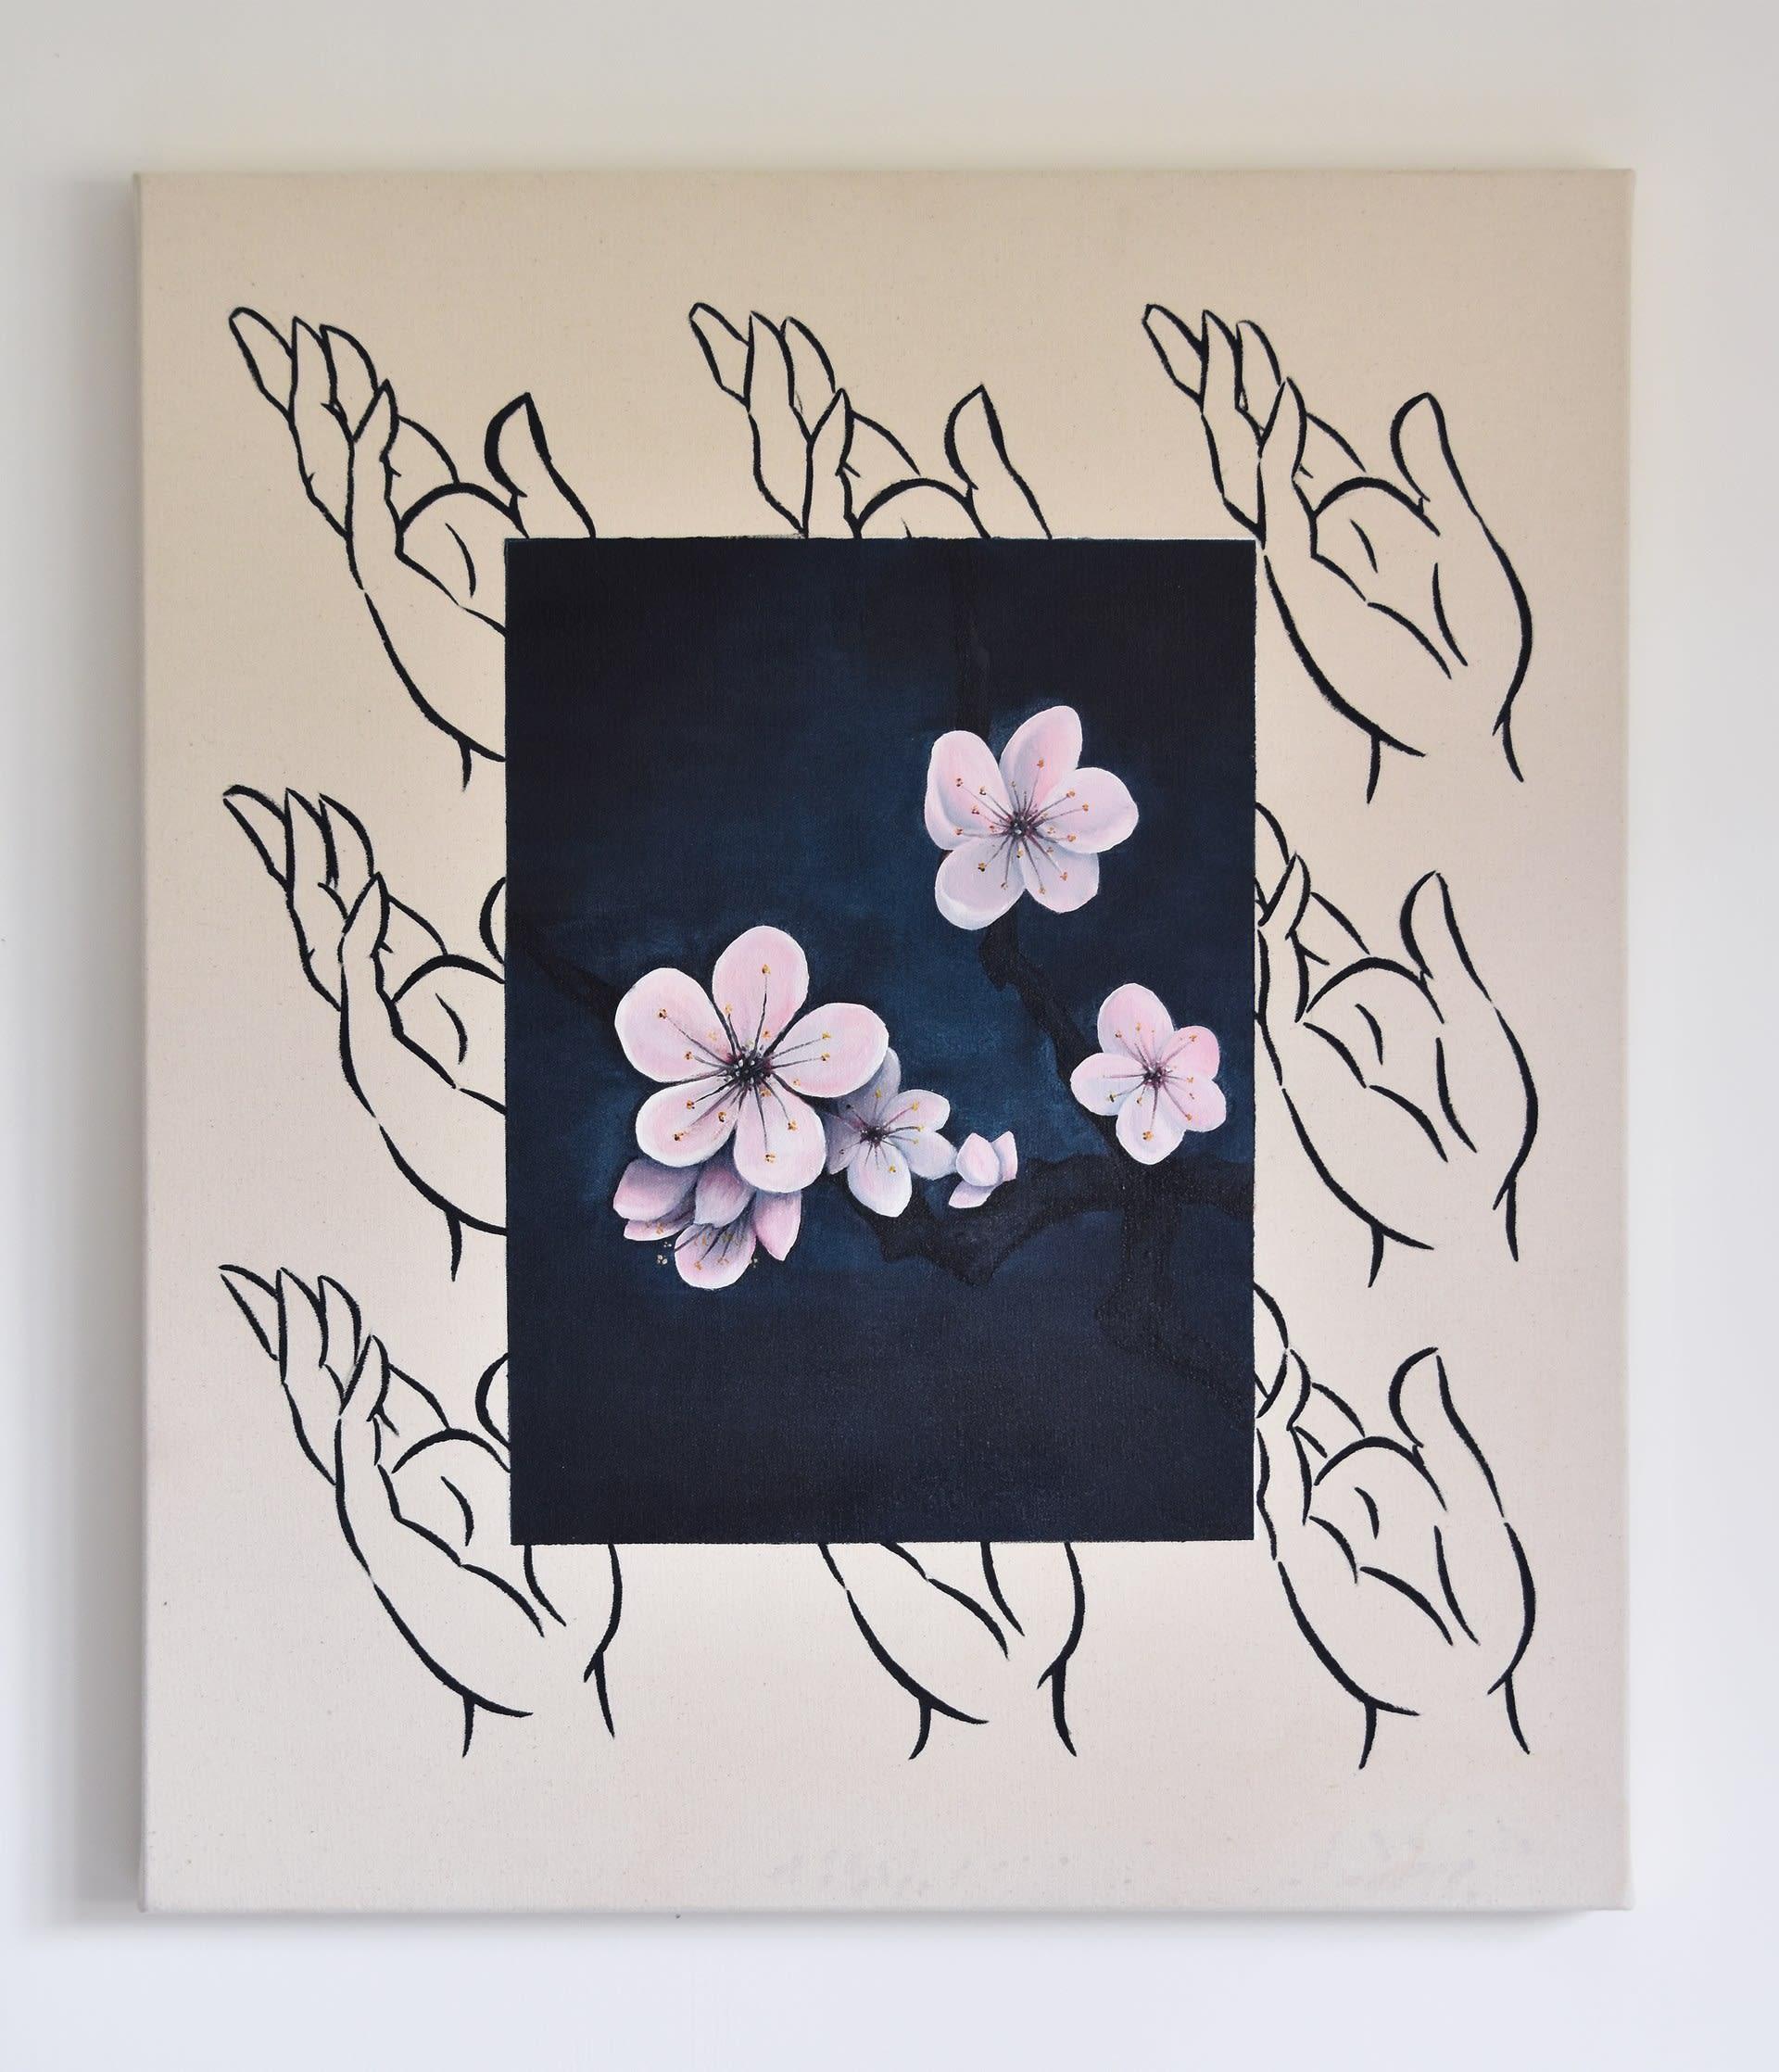 Prunus Mume, Oil & acrylic on canvas, 70cm x 60cm, 2020